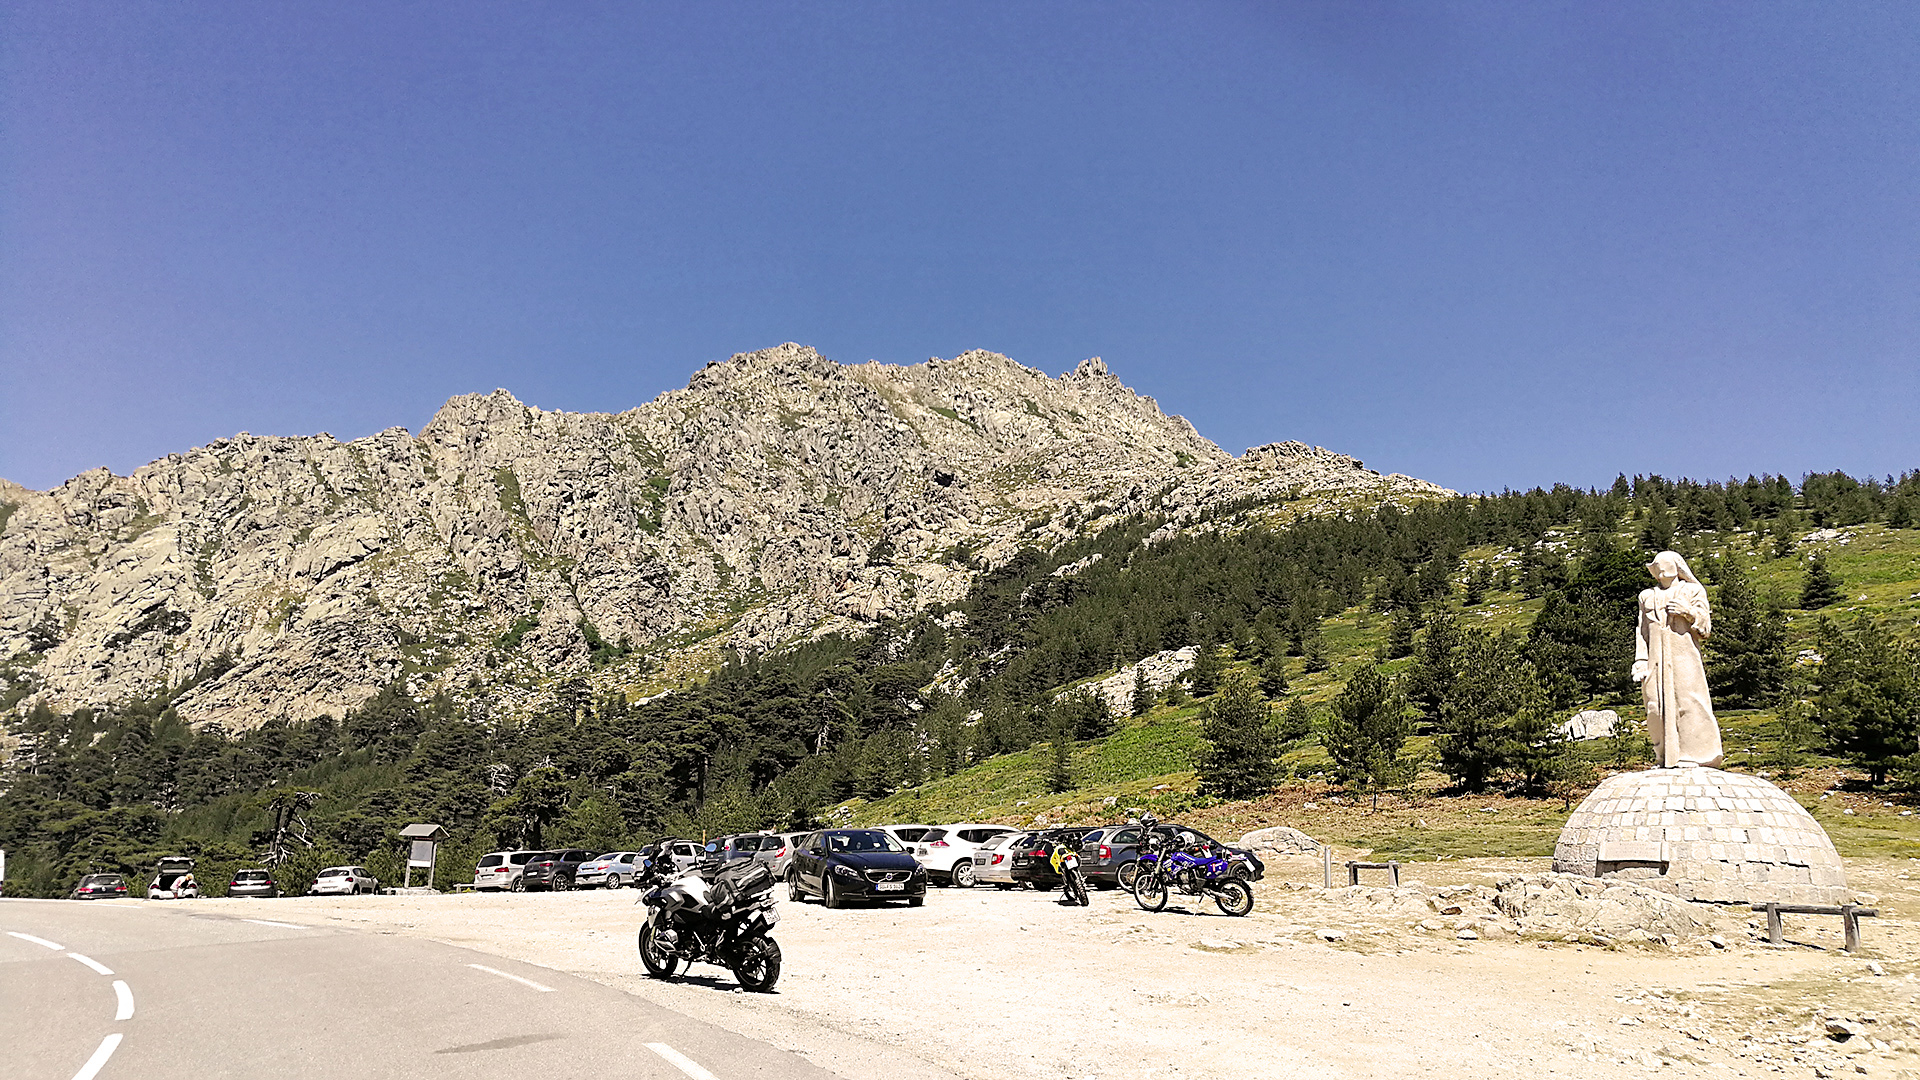 1467 - F (Corse) - Col de Vergio (Bocca di Verghju)